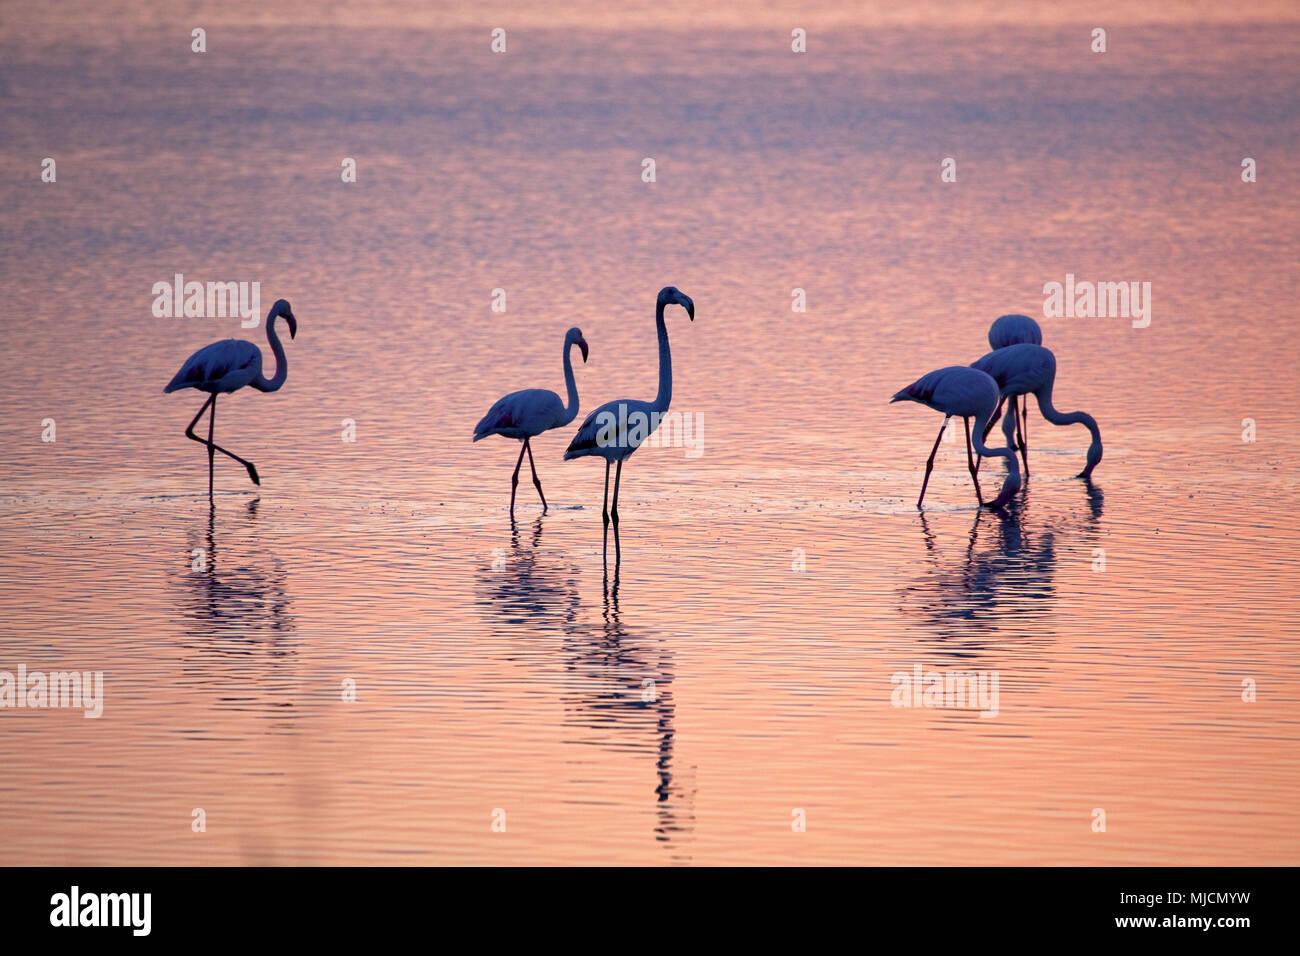 L'Italia, Sardegna, West Coast, Oristano, penisola del Sinis, Porto Mandriola, Capo Mannu, Stagno di Sale Porcus, flamingo, Atmosfera mattutina, Immagini Stock